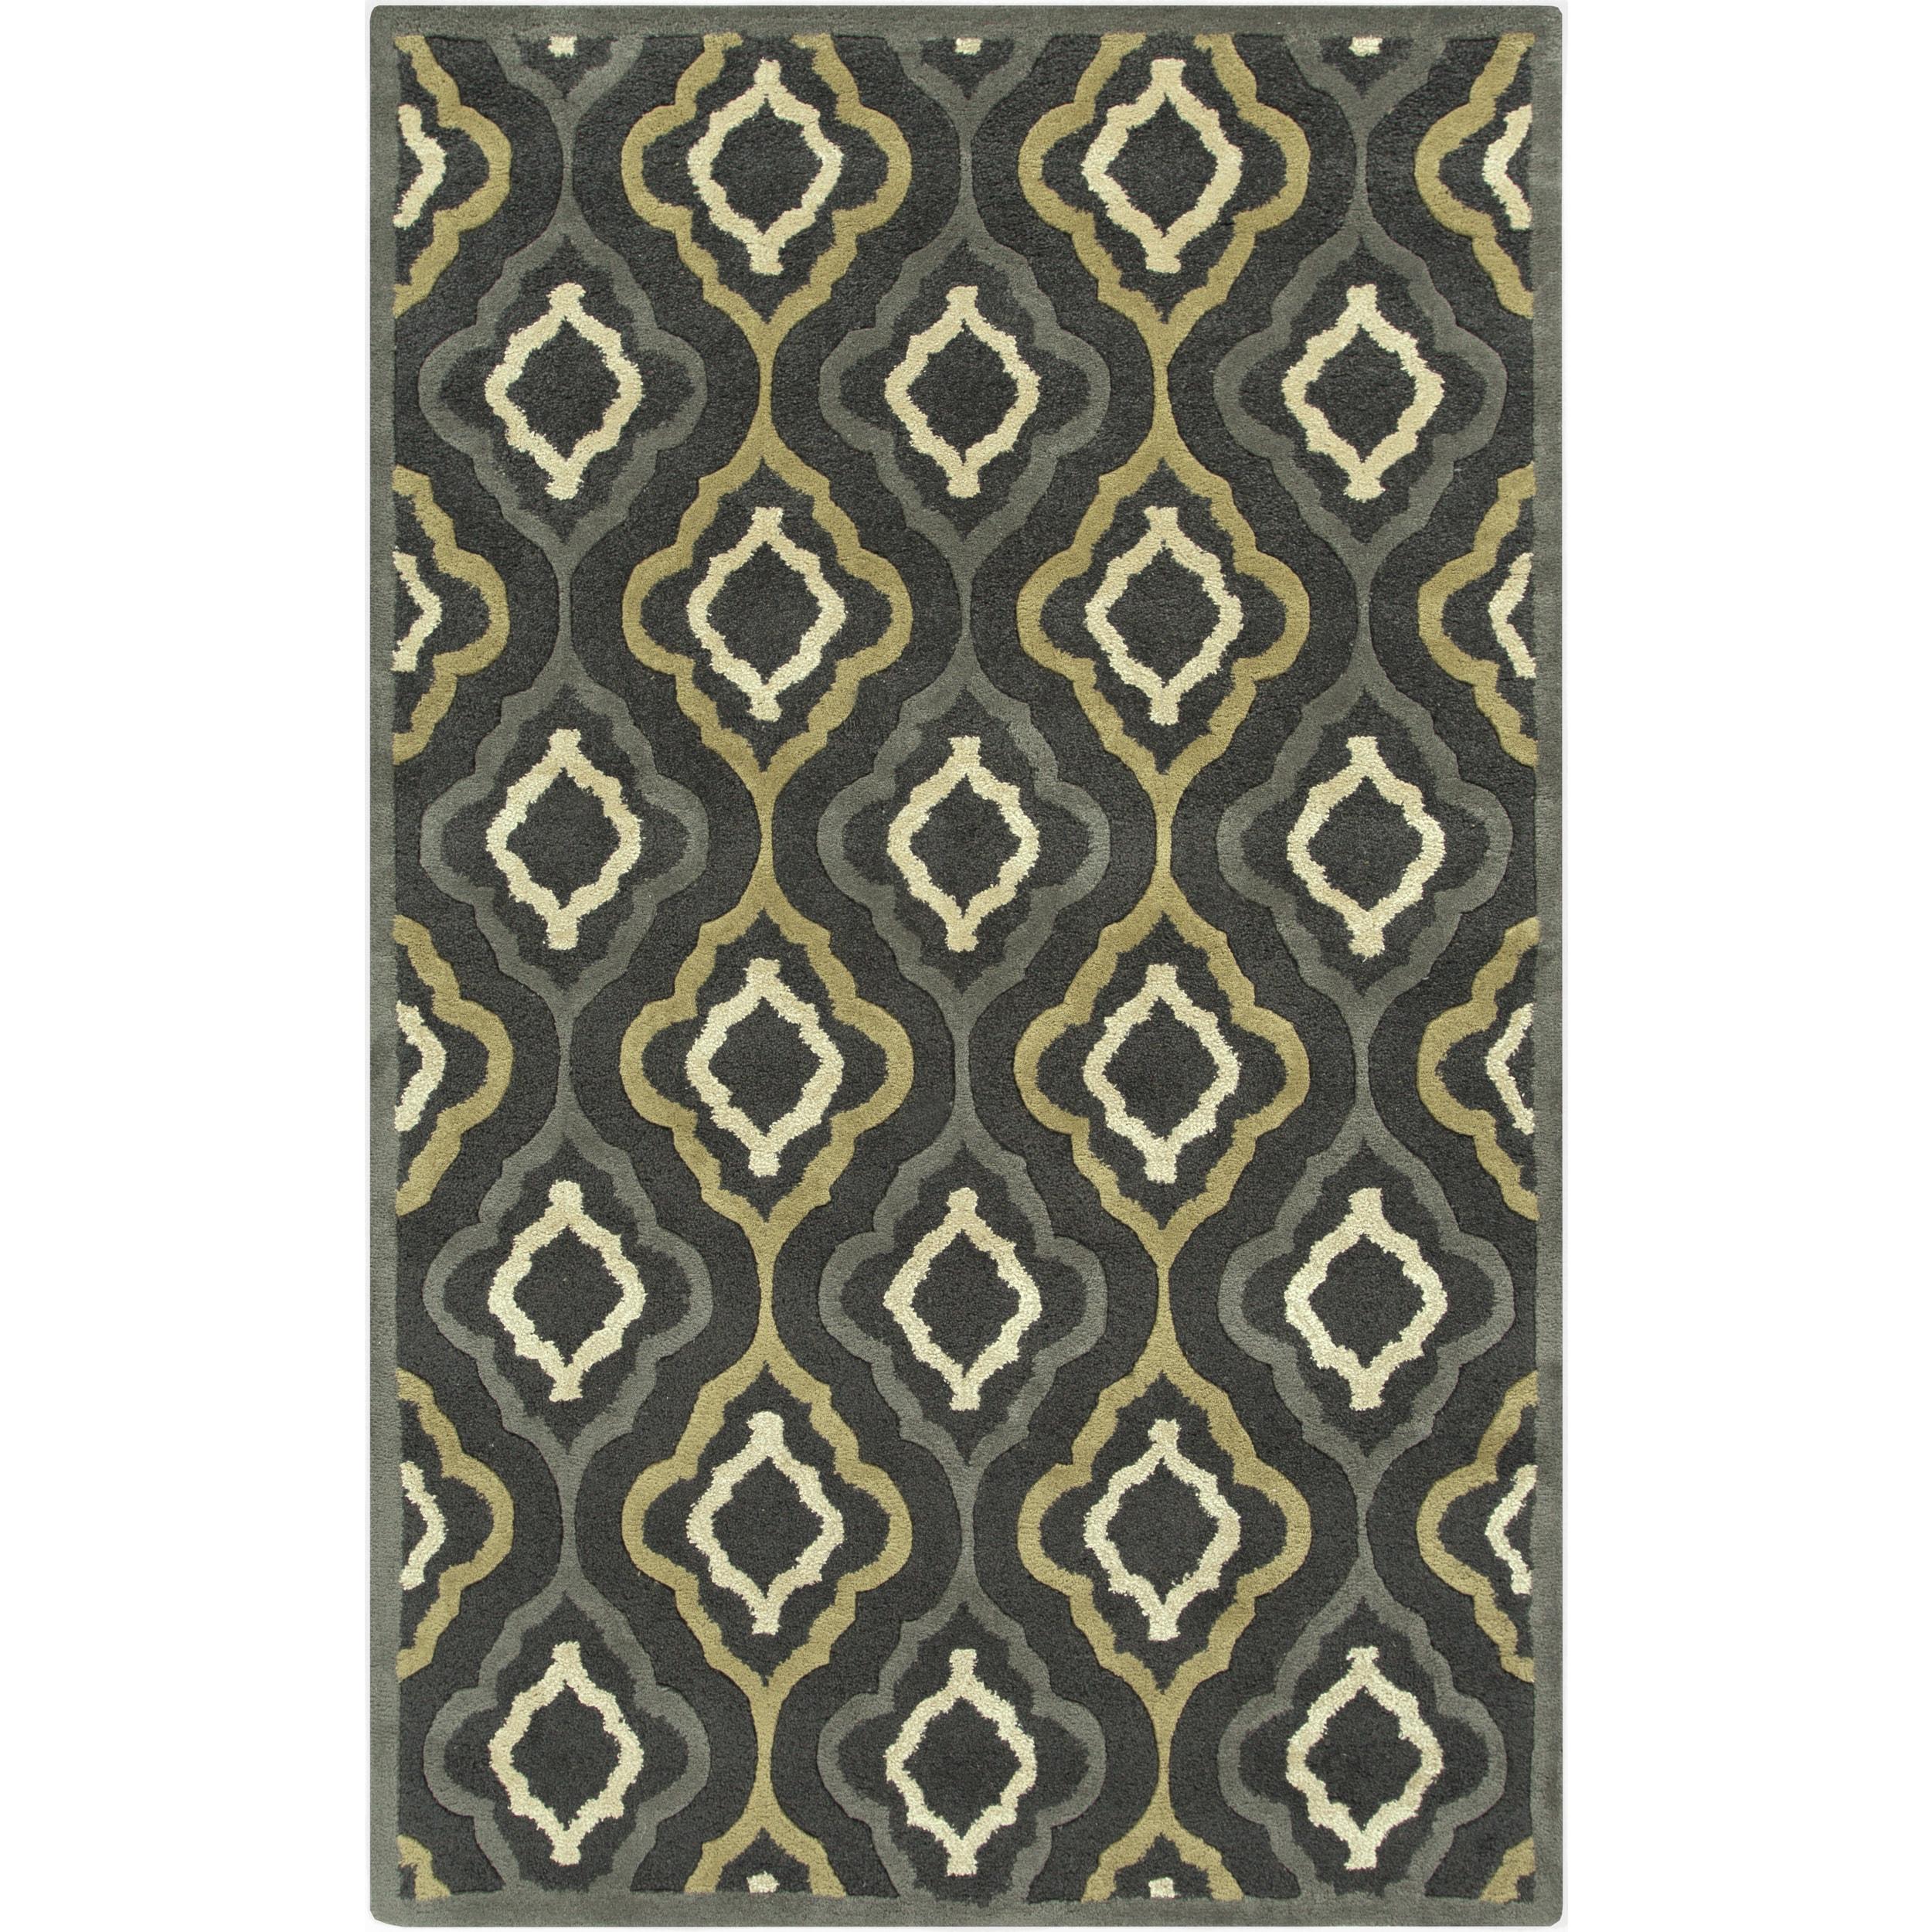 SURYA Hand-Tufted Payten Morrocan Trellis Rug (9' x 13') ...